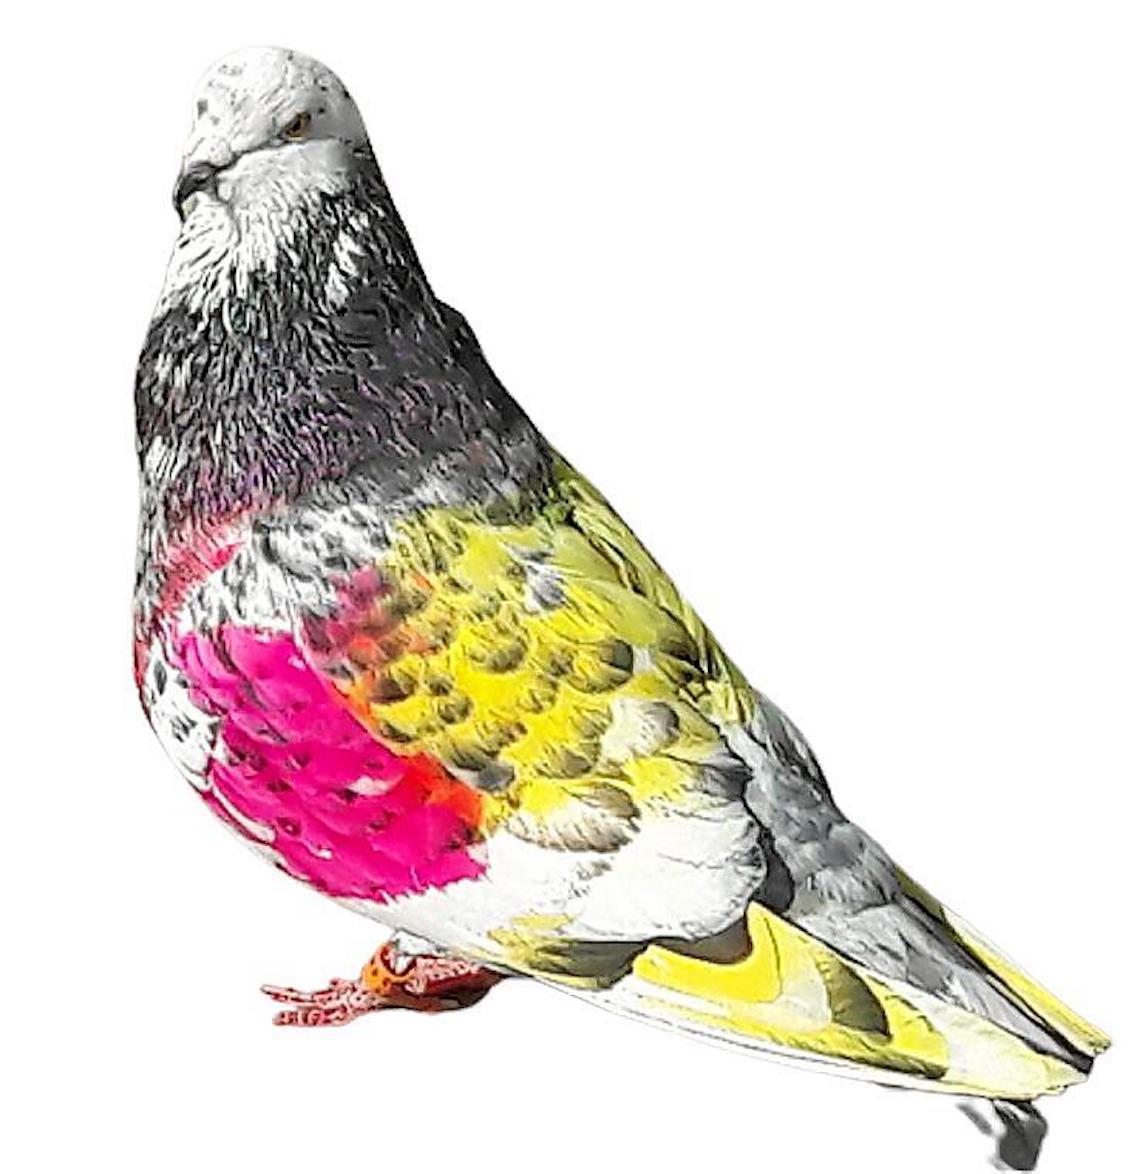 Painted pigeon.